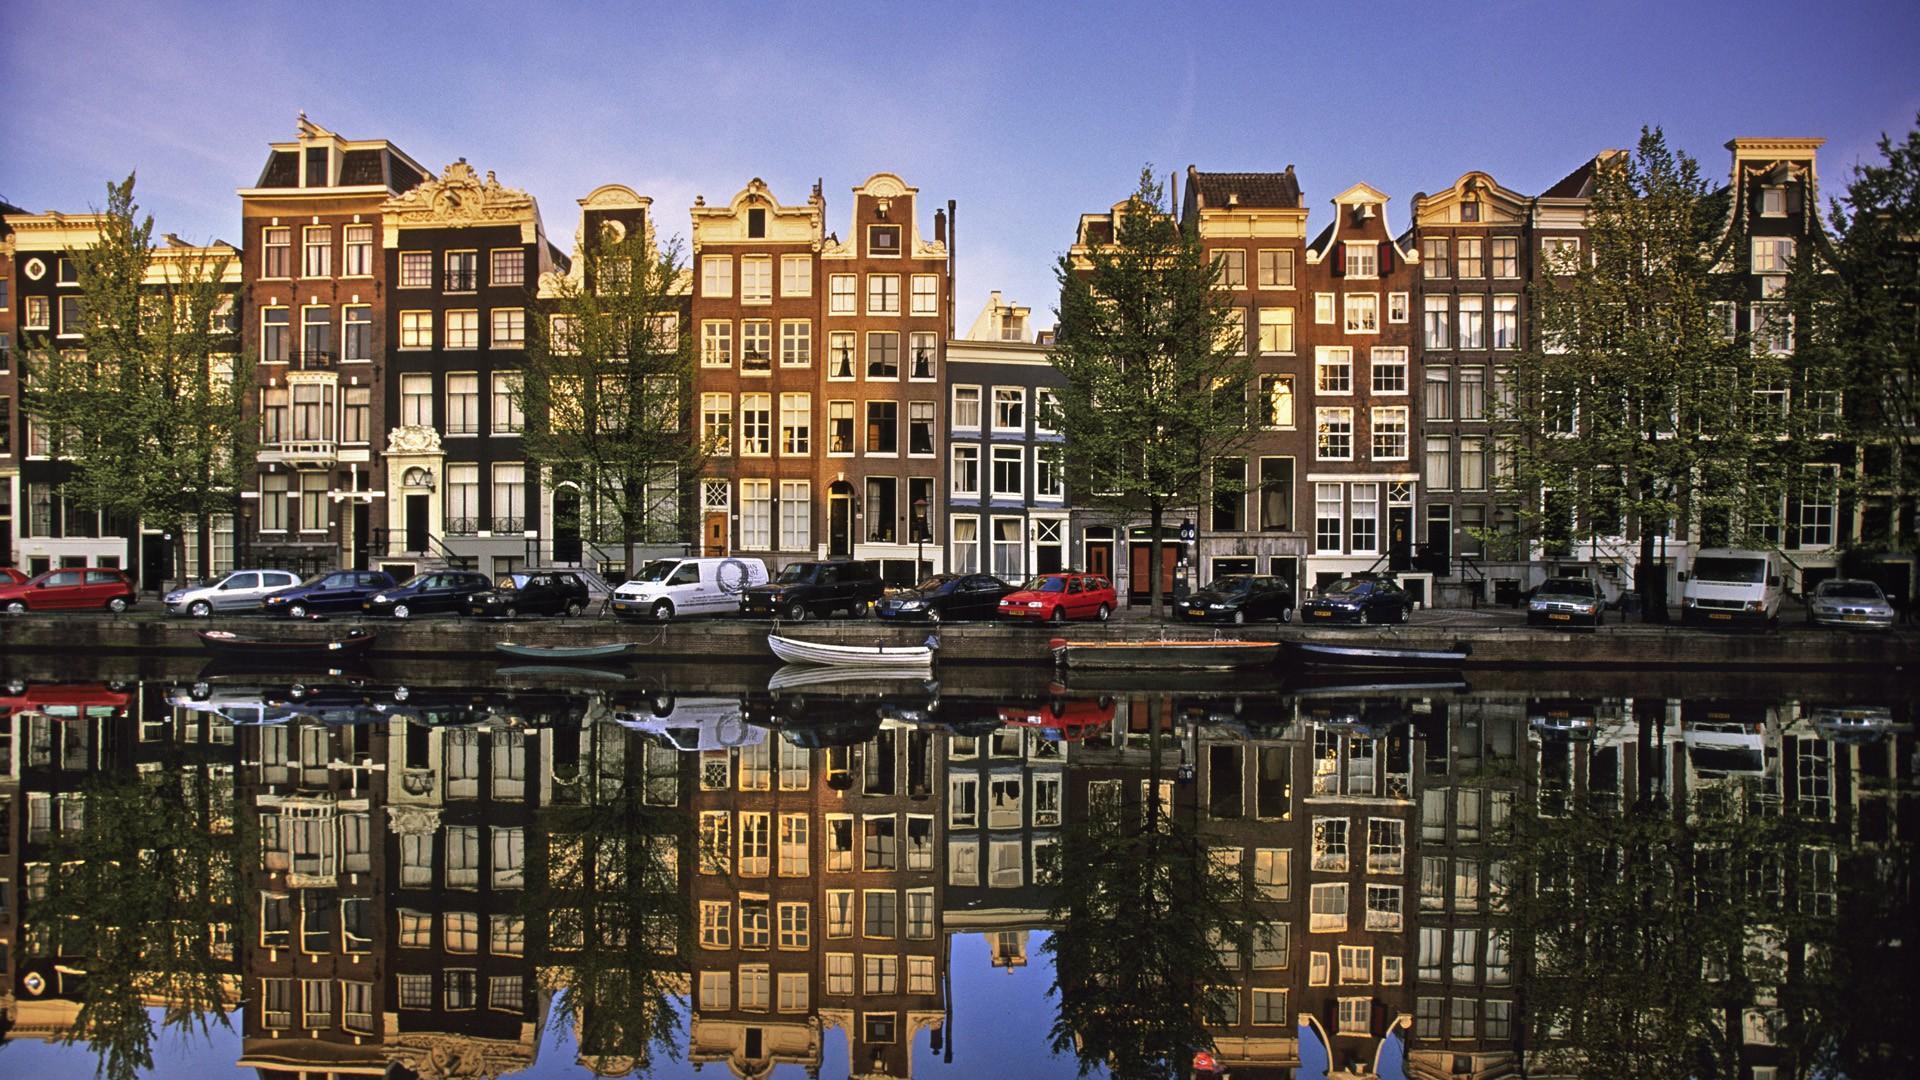 Amsterdam 4K